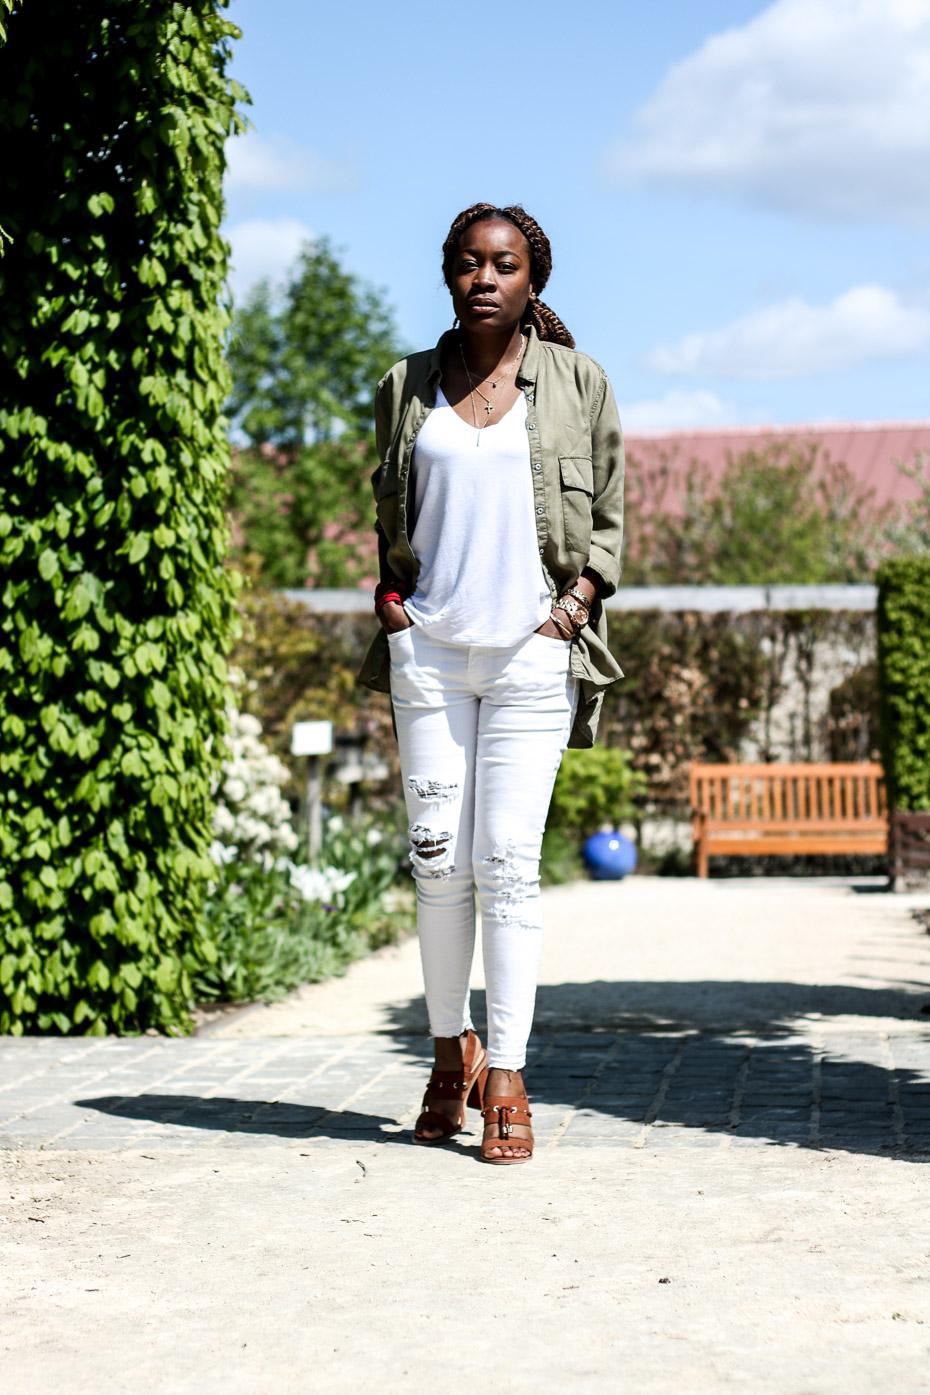 total-look-blanc-chemise-kaki-chaussures-camel